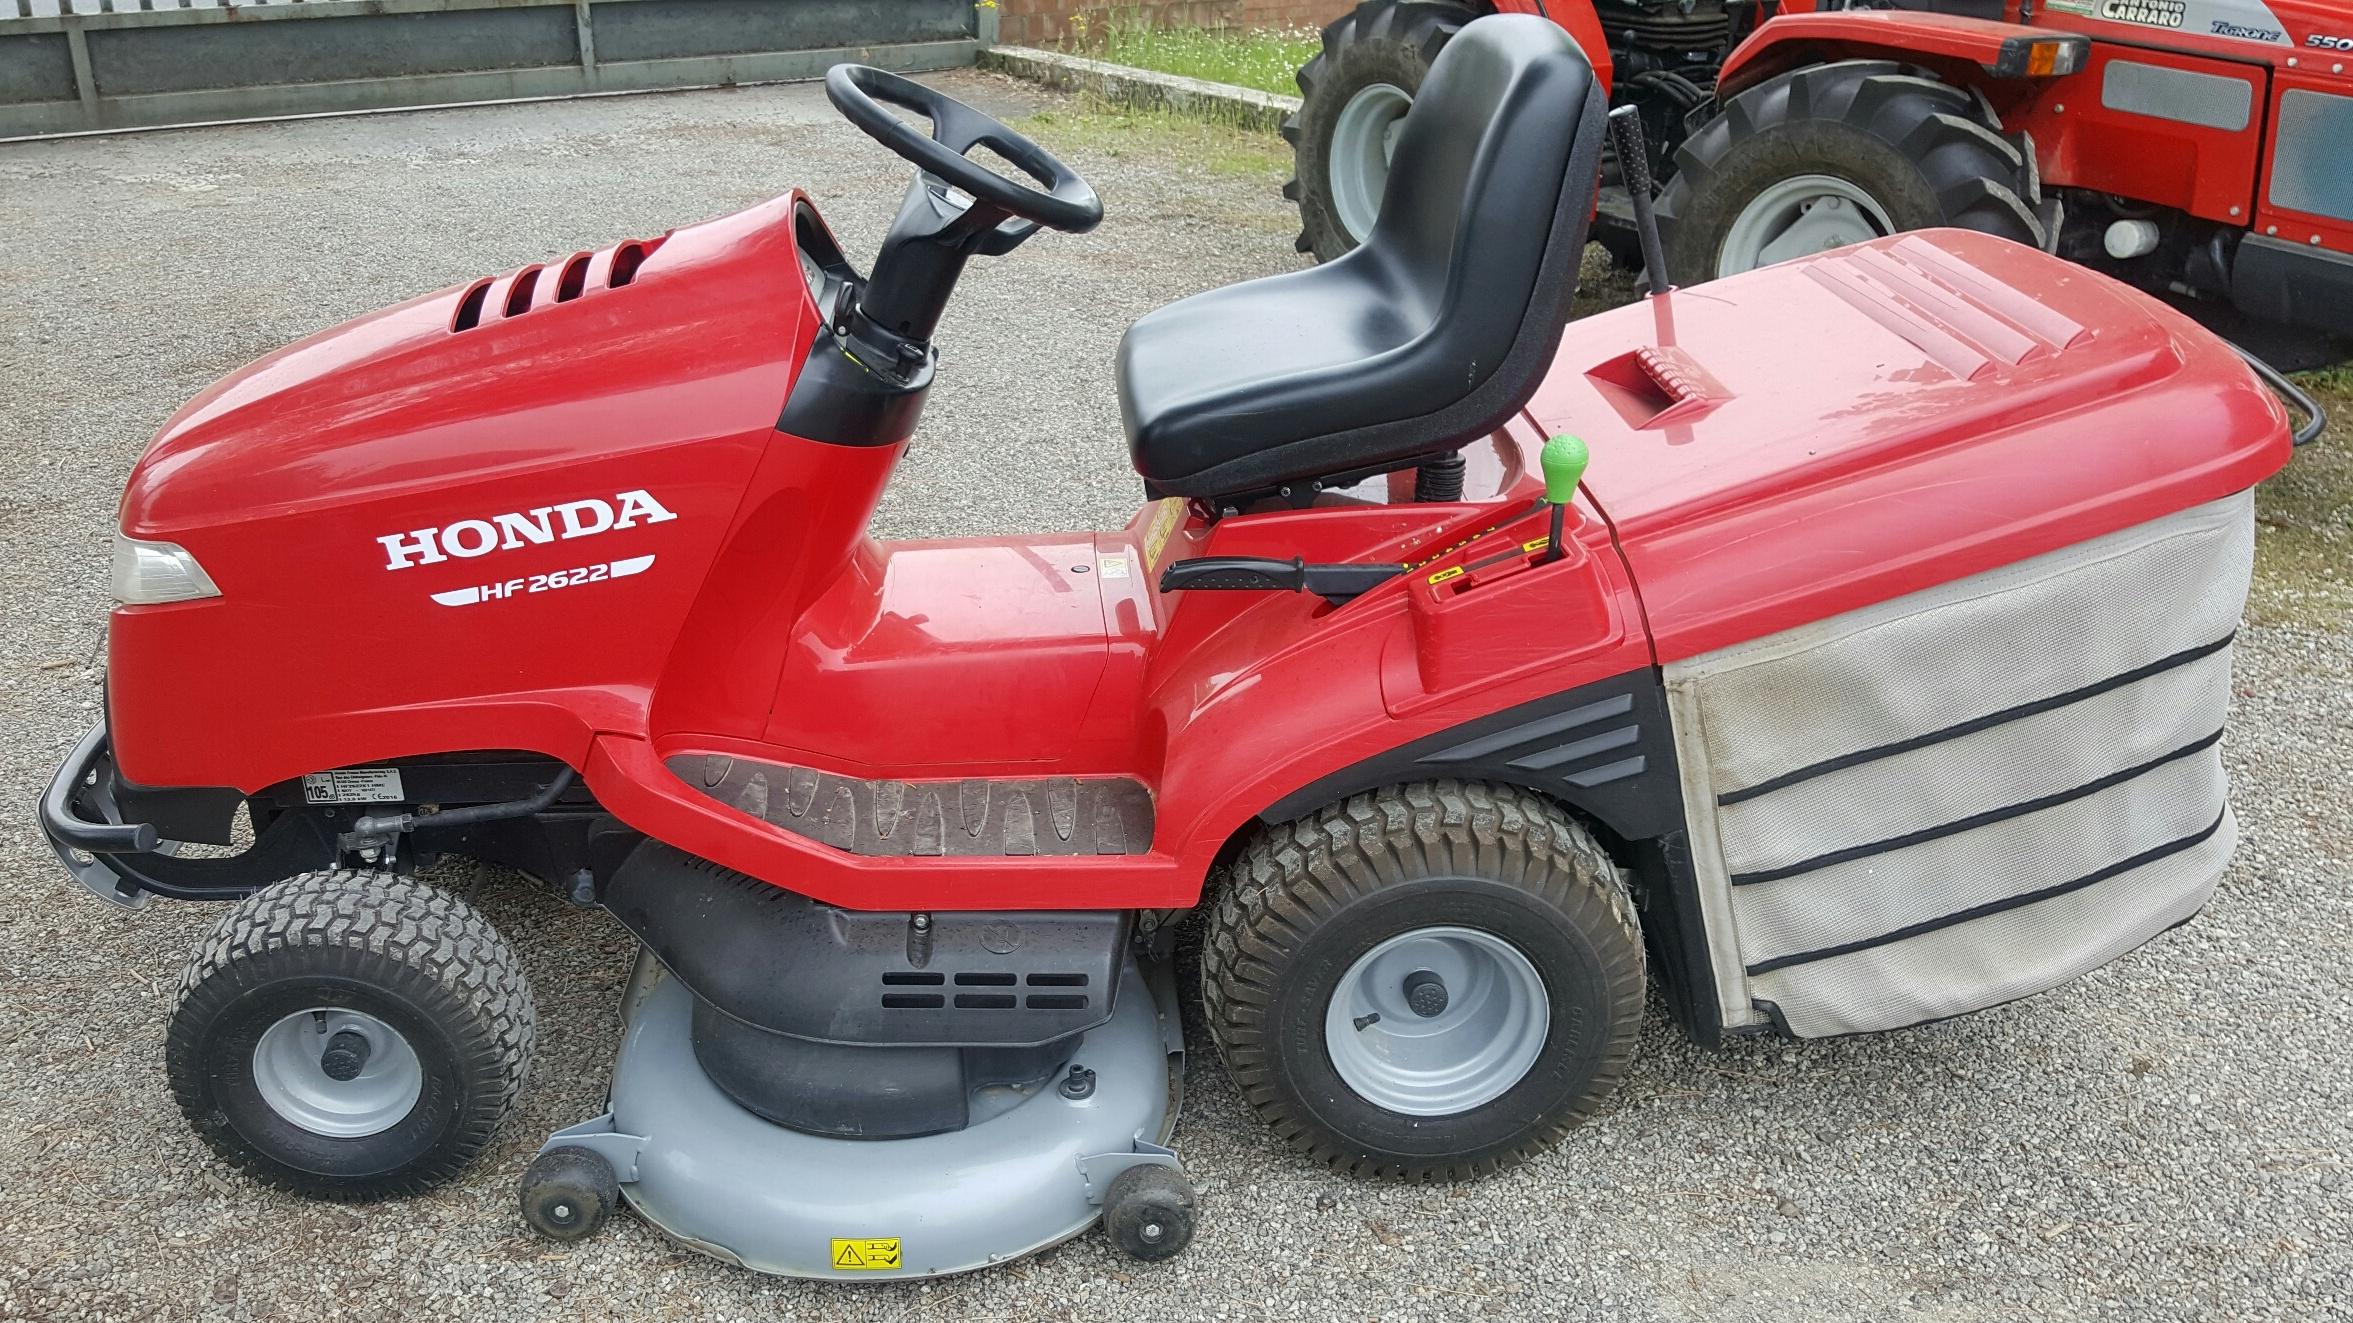 Centro senese macchine agricole for Generatore honda eu20i usato